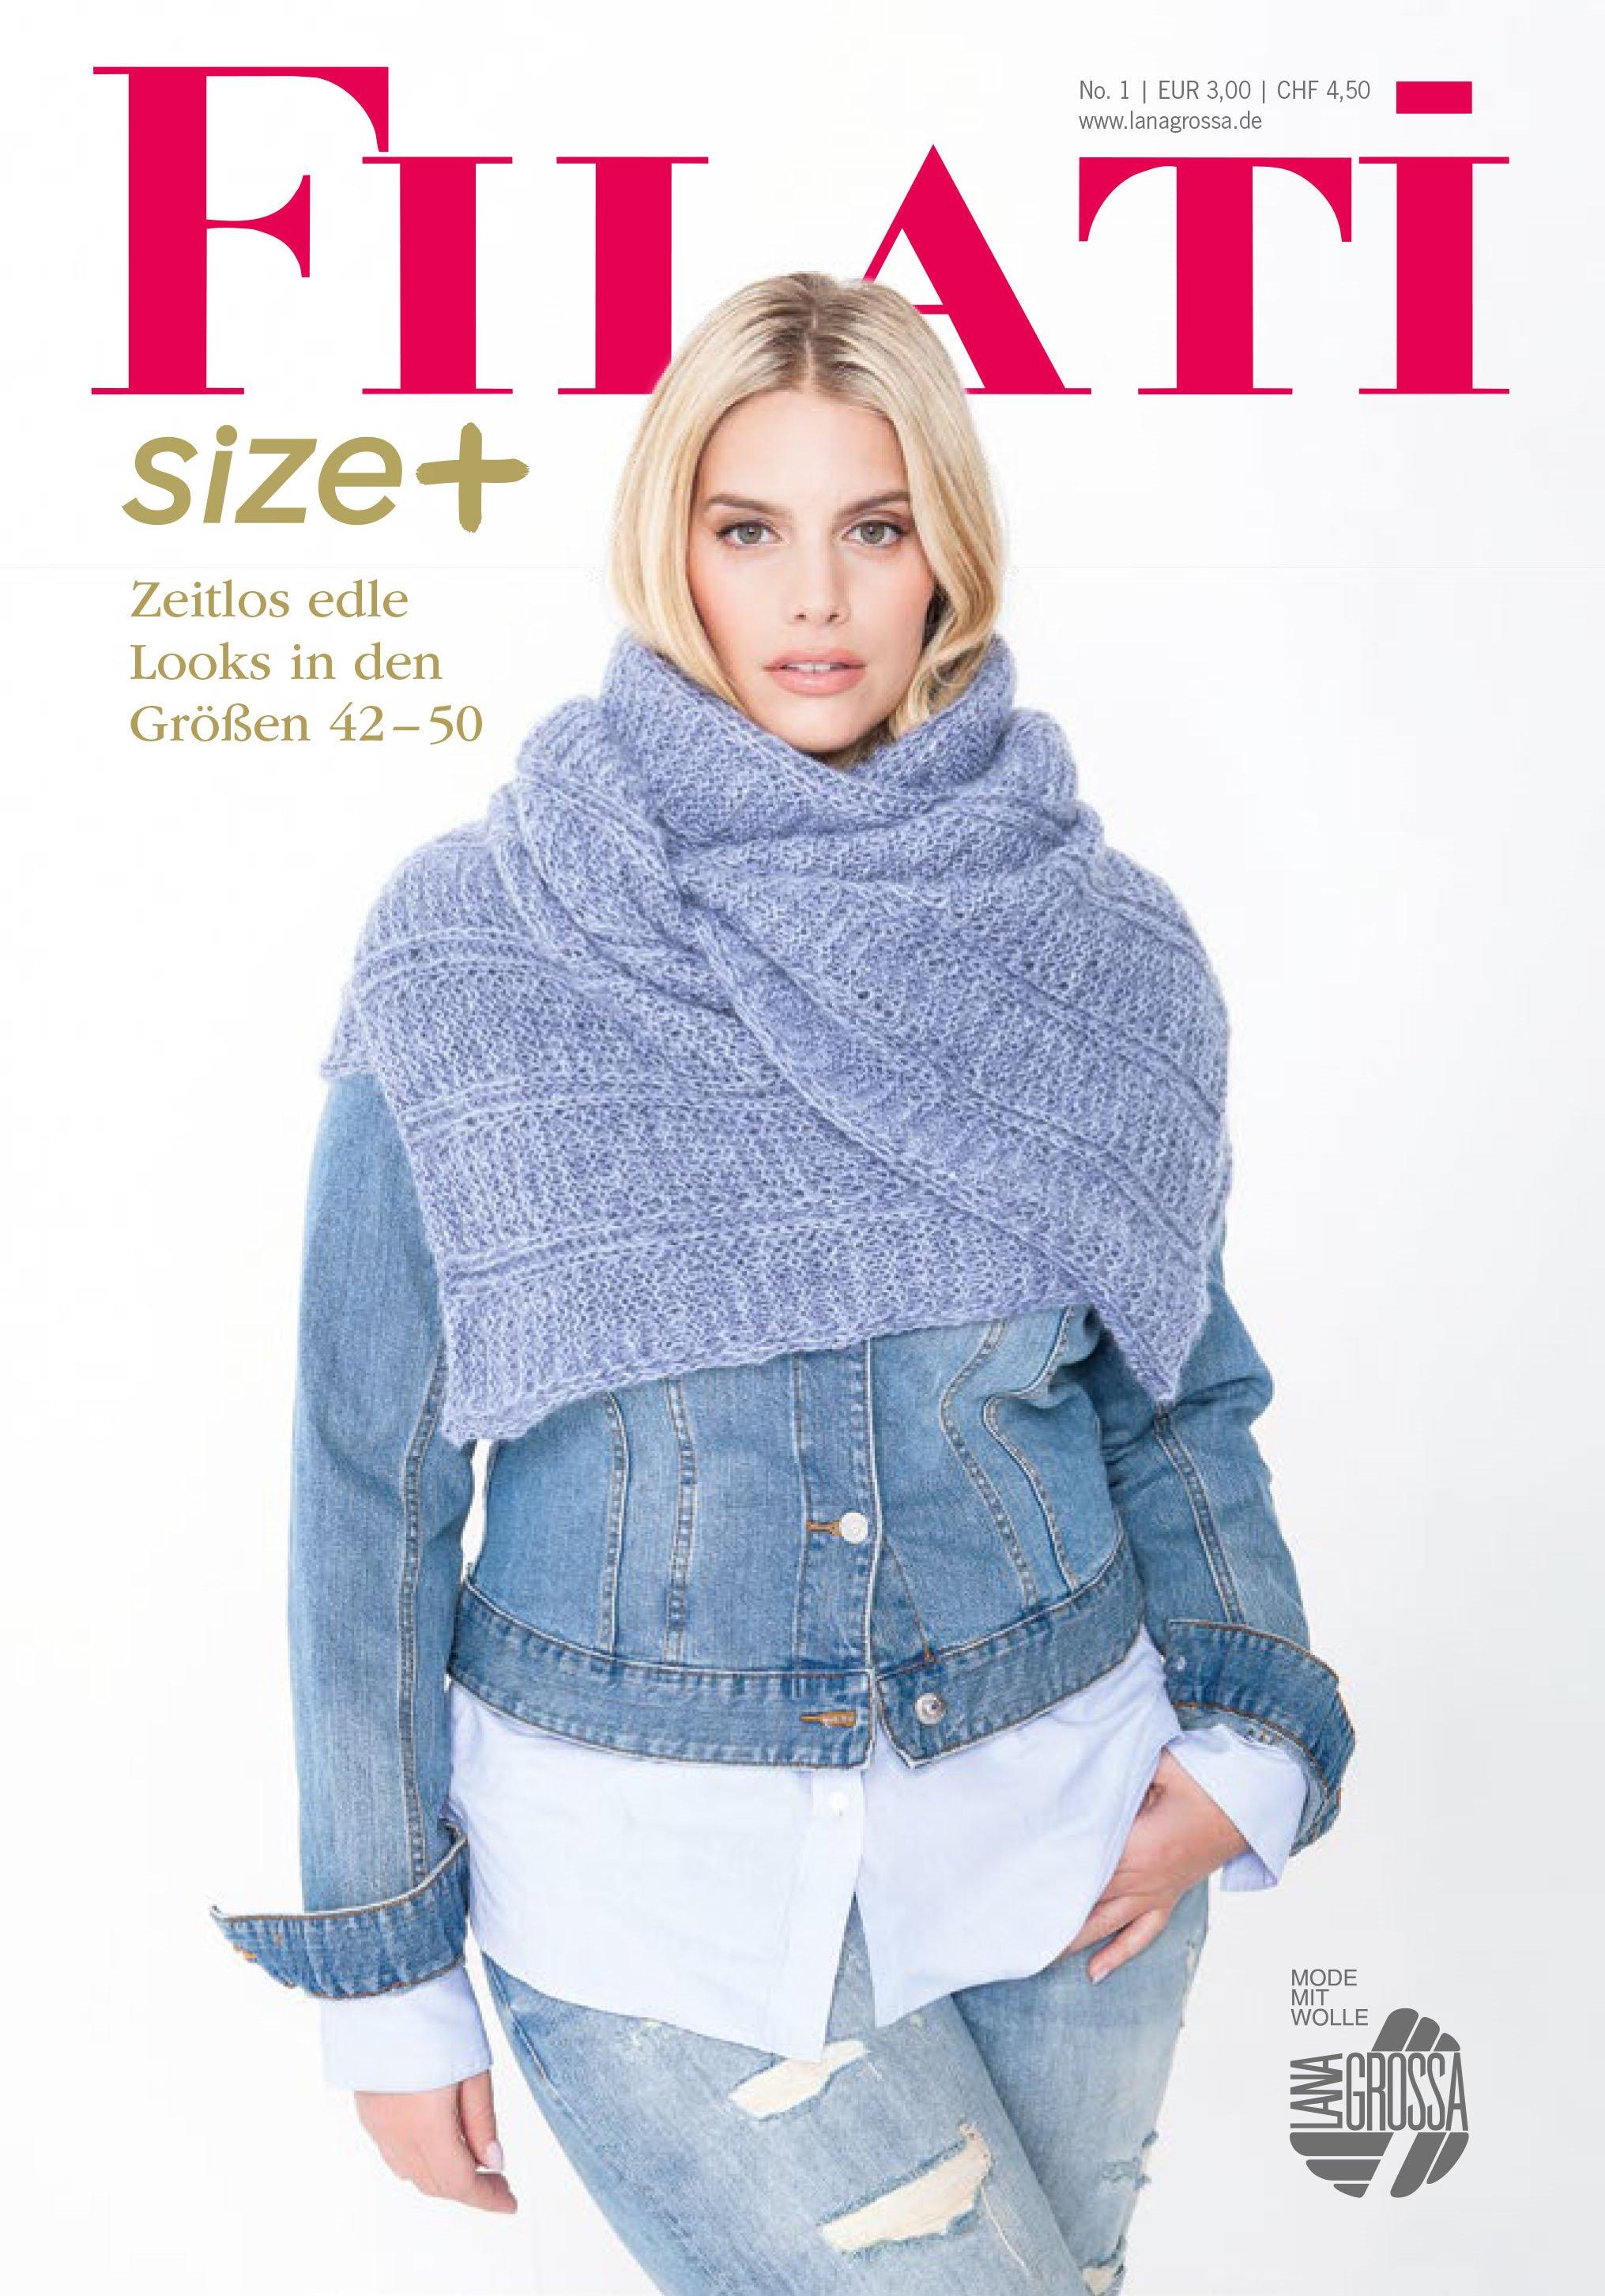 Lana Grossa FILATI Size Plus - Magazine (DE) + Knitting instructions (EN)